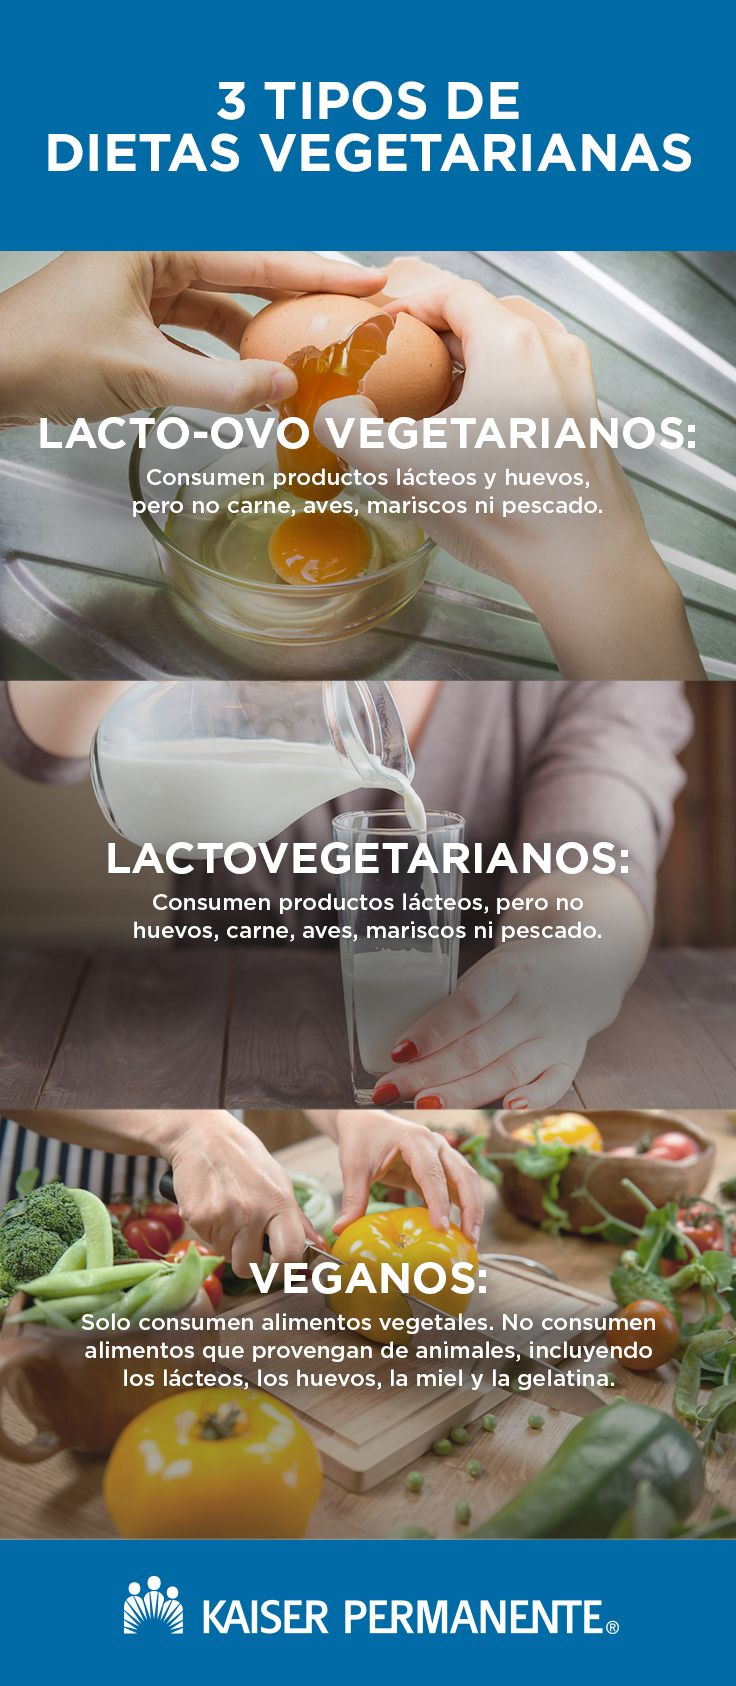 Tipos de dietas vegetarianas vegana